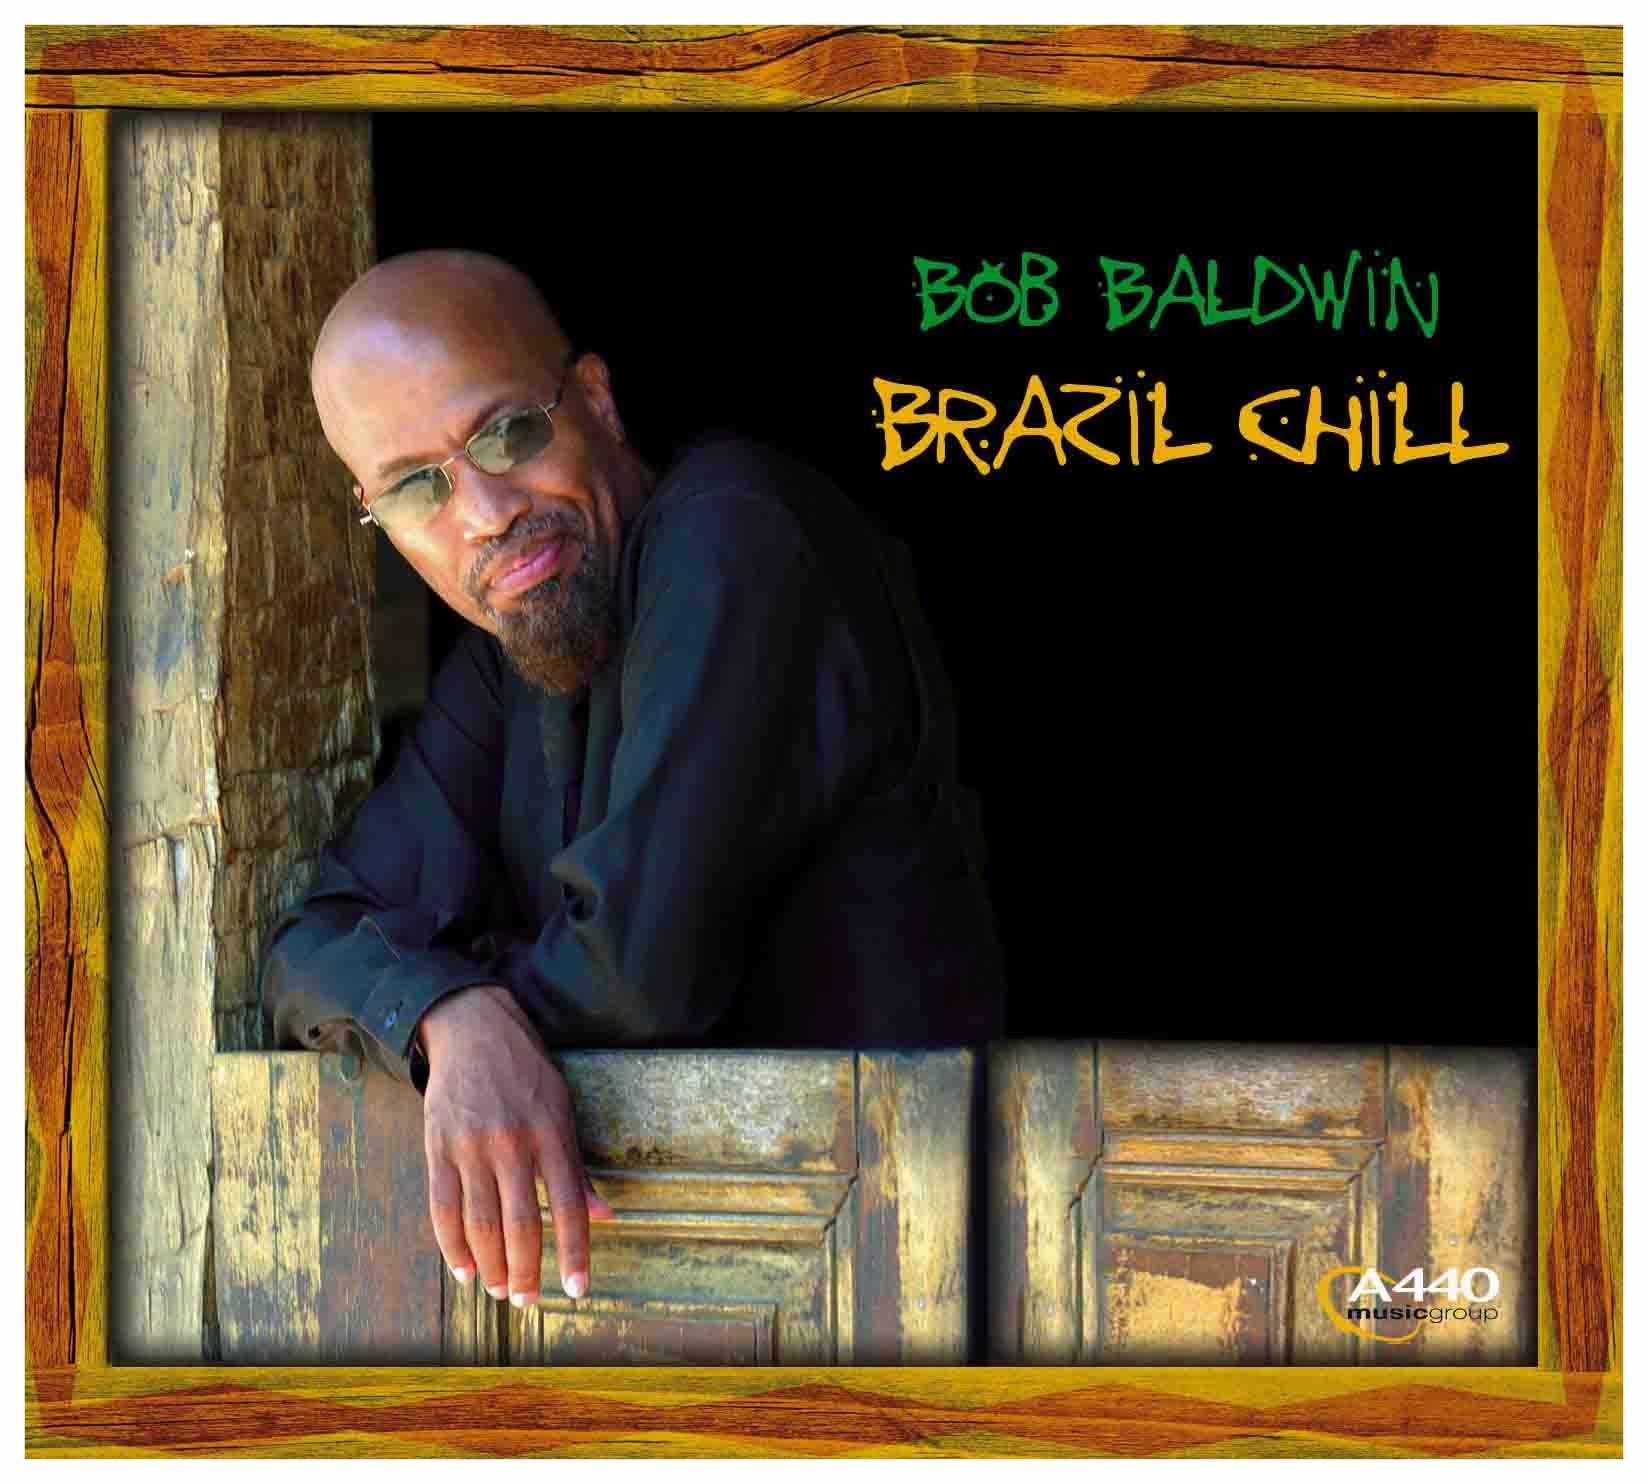 2004 - Brazil Chill